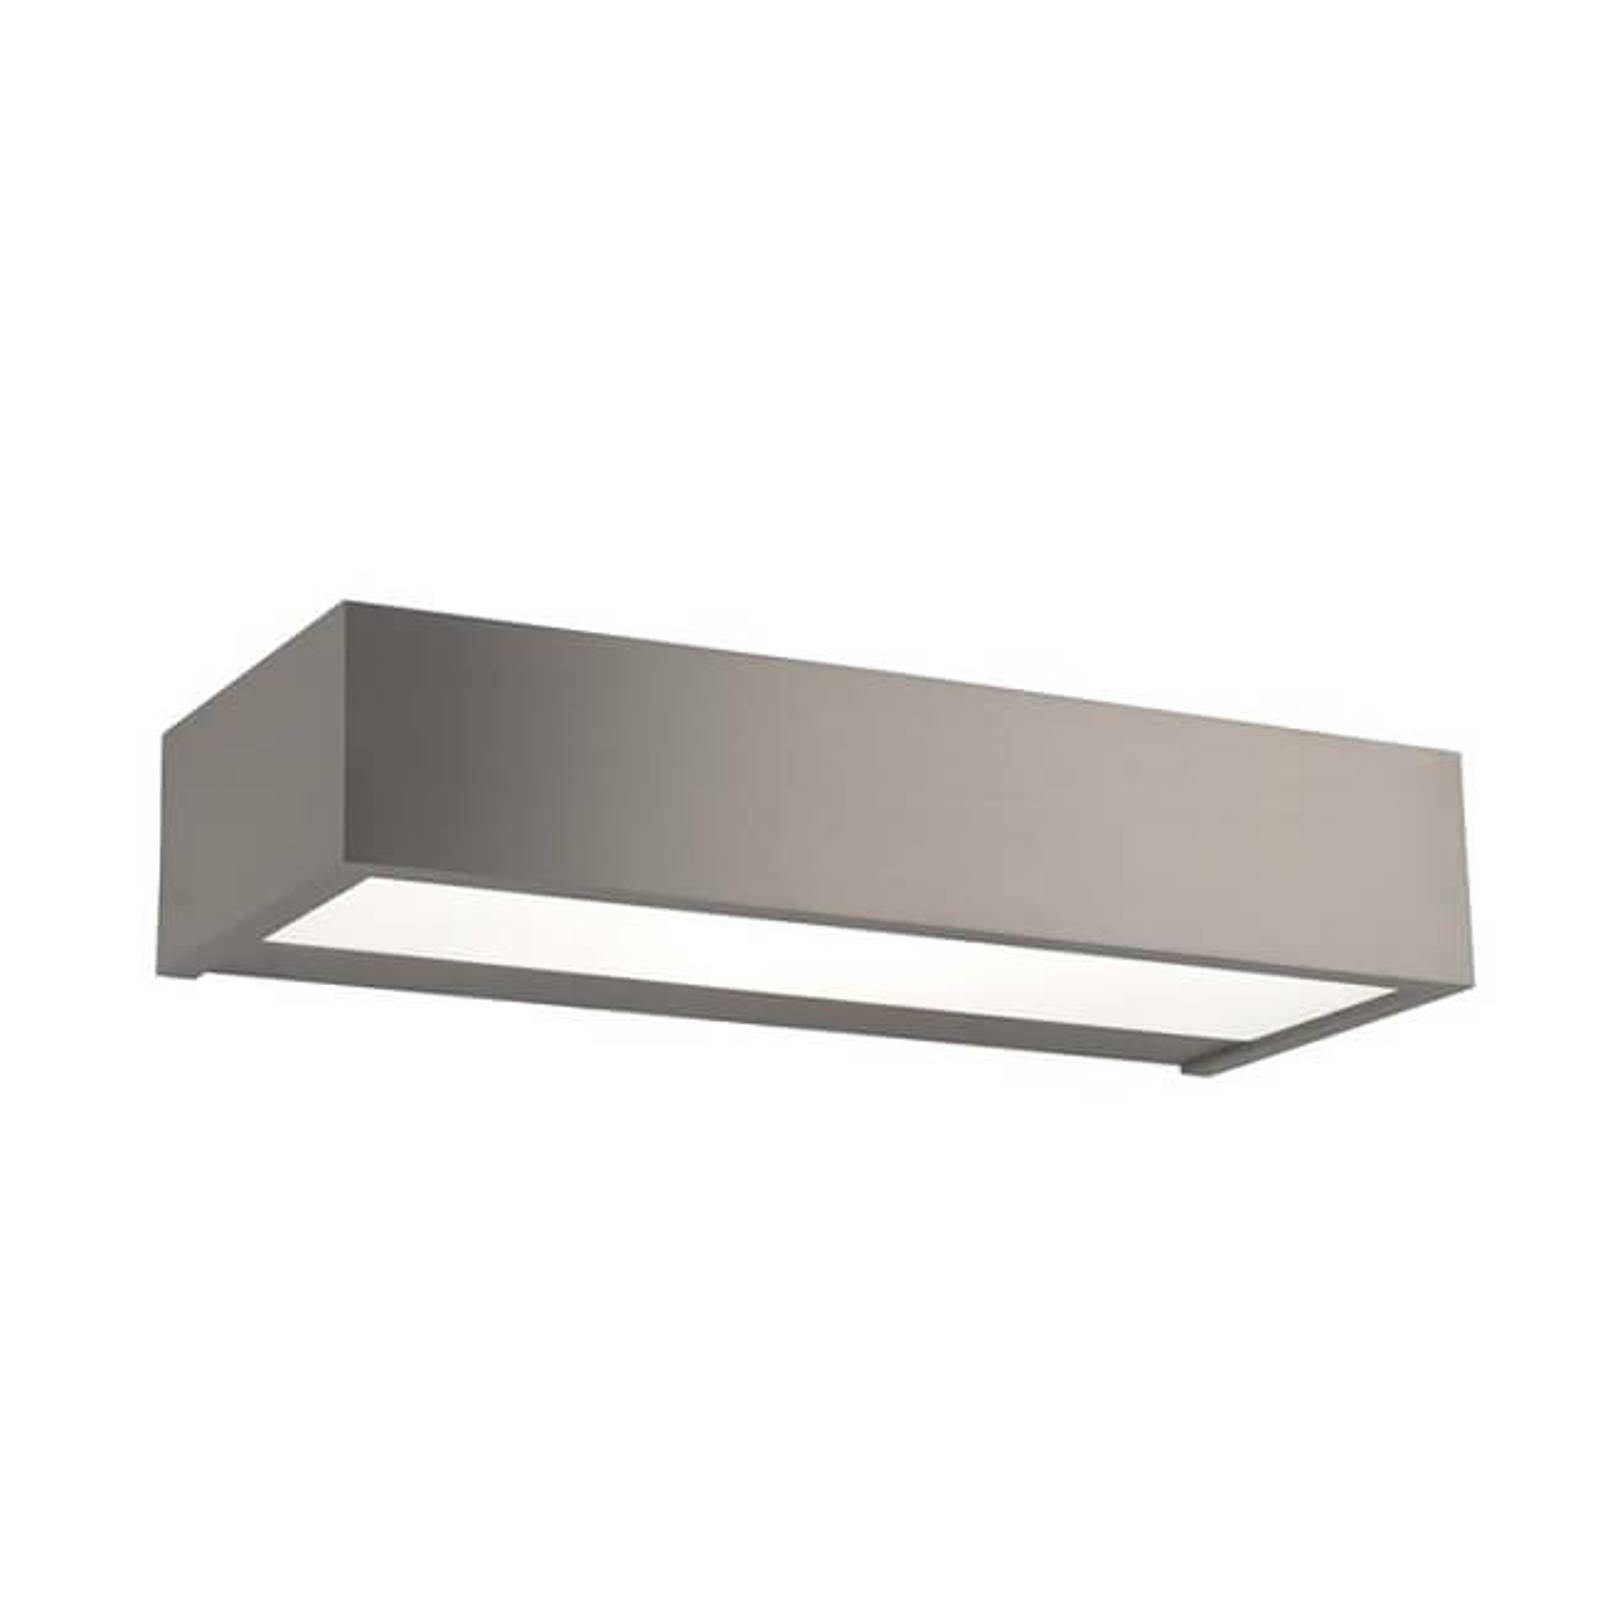 Apolo - LED wandlamp voor de badkamer, 30 cm